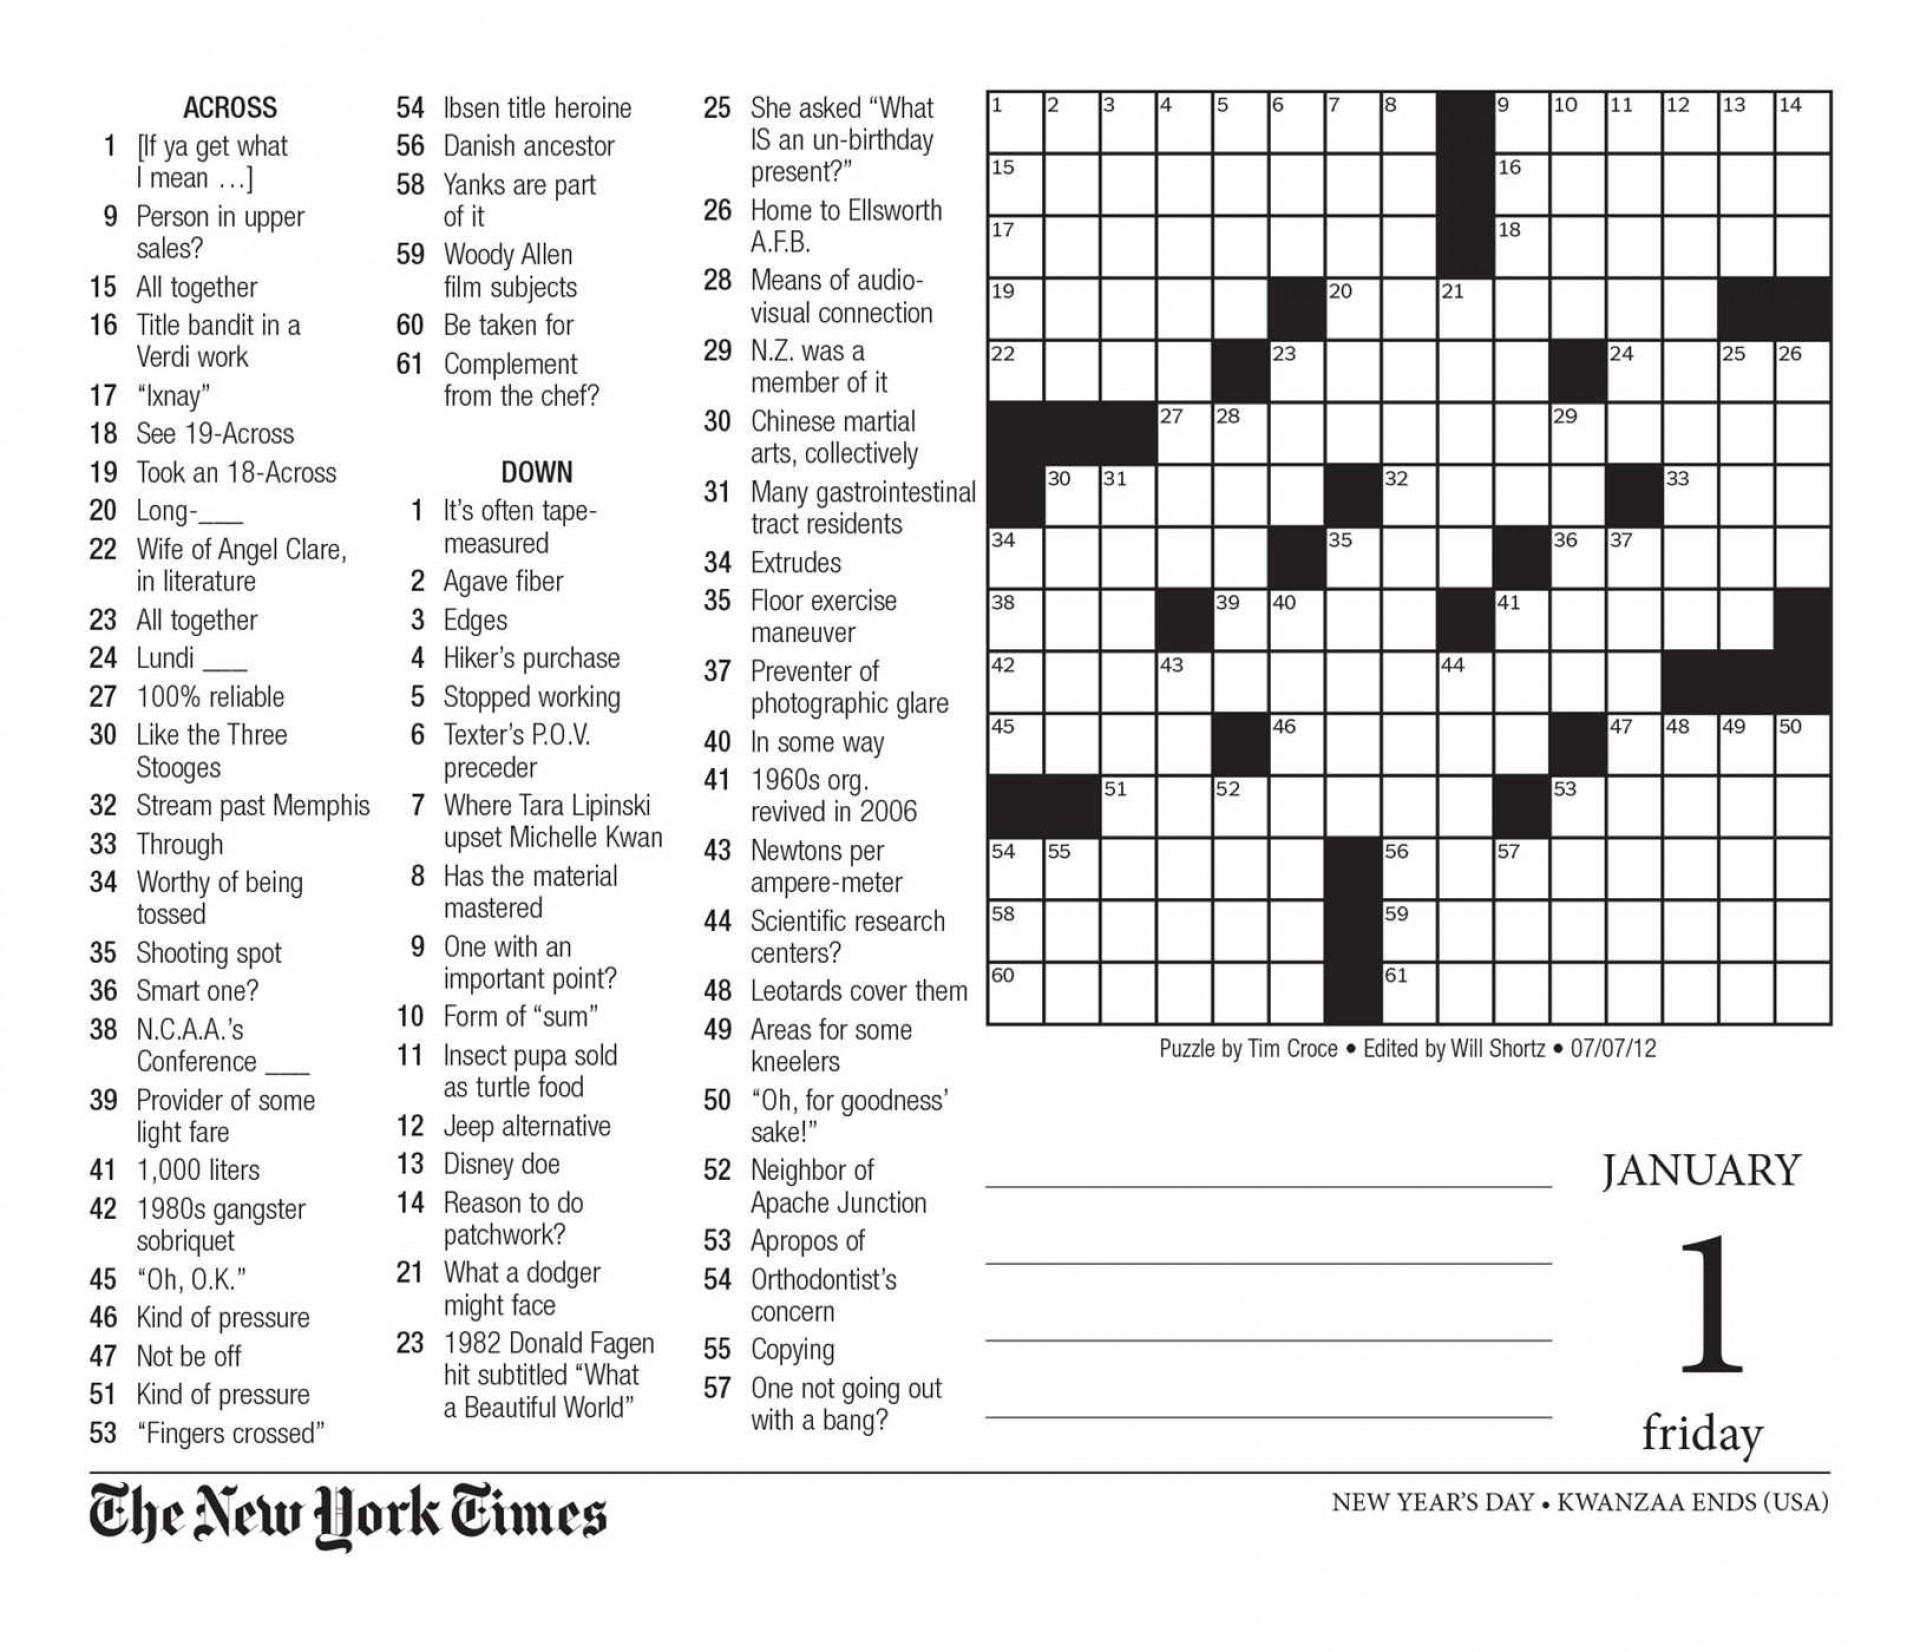 Free Printable Large Print Crossword Puzzles   M3U8 - Free Printable - Large Print Crossword Puzzles Printable